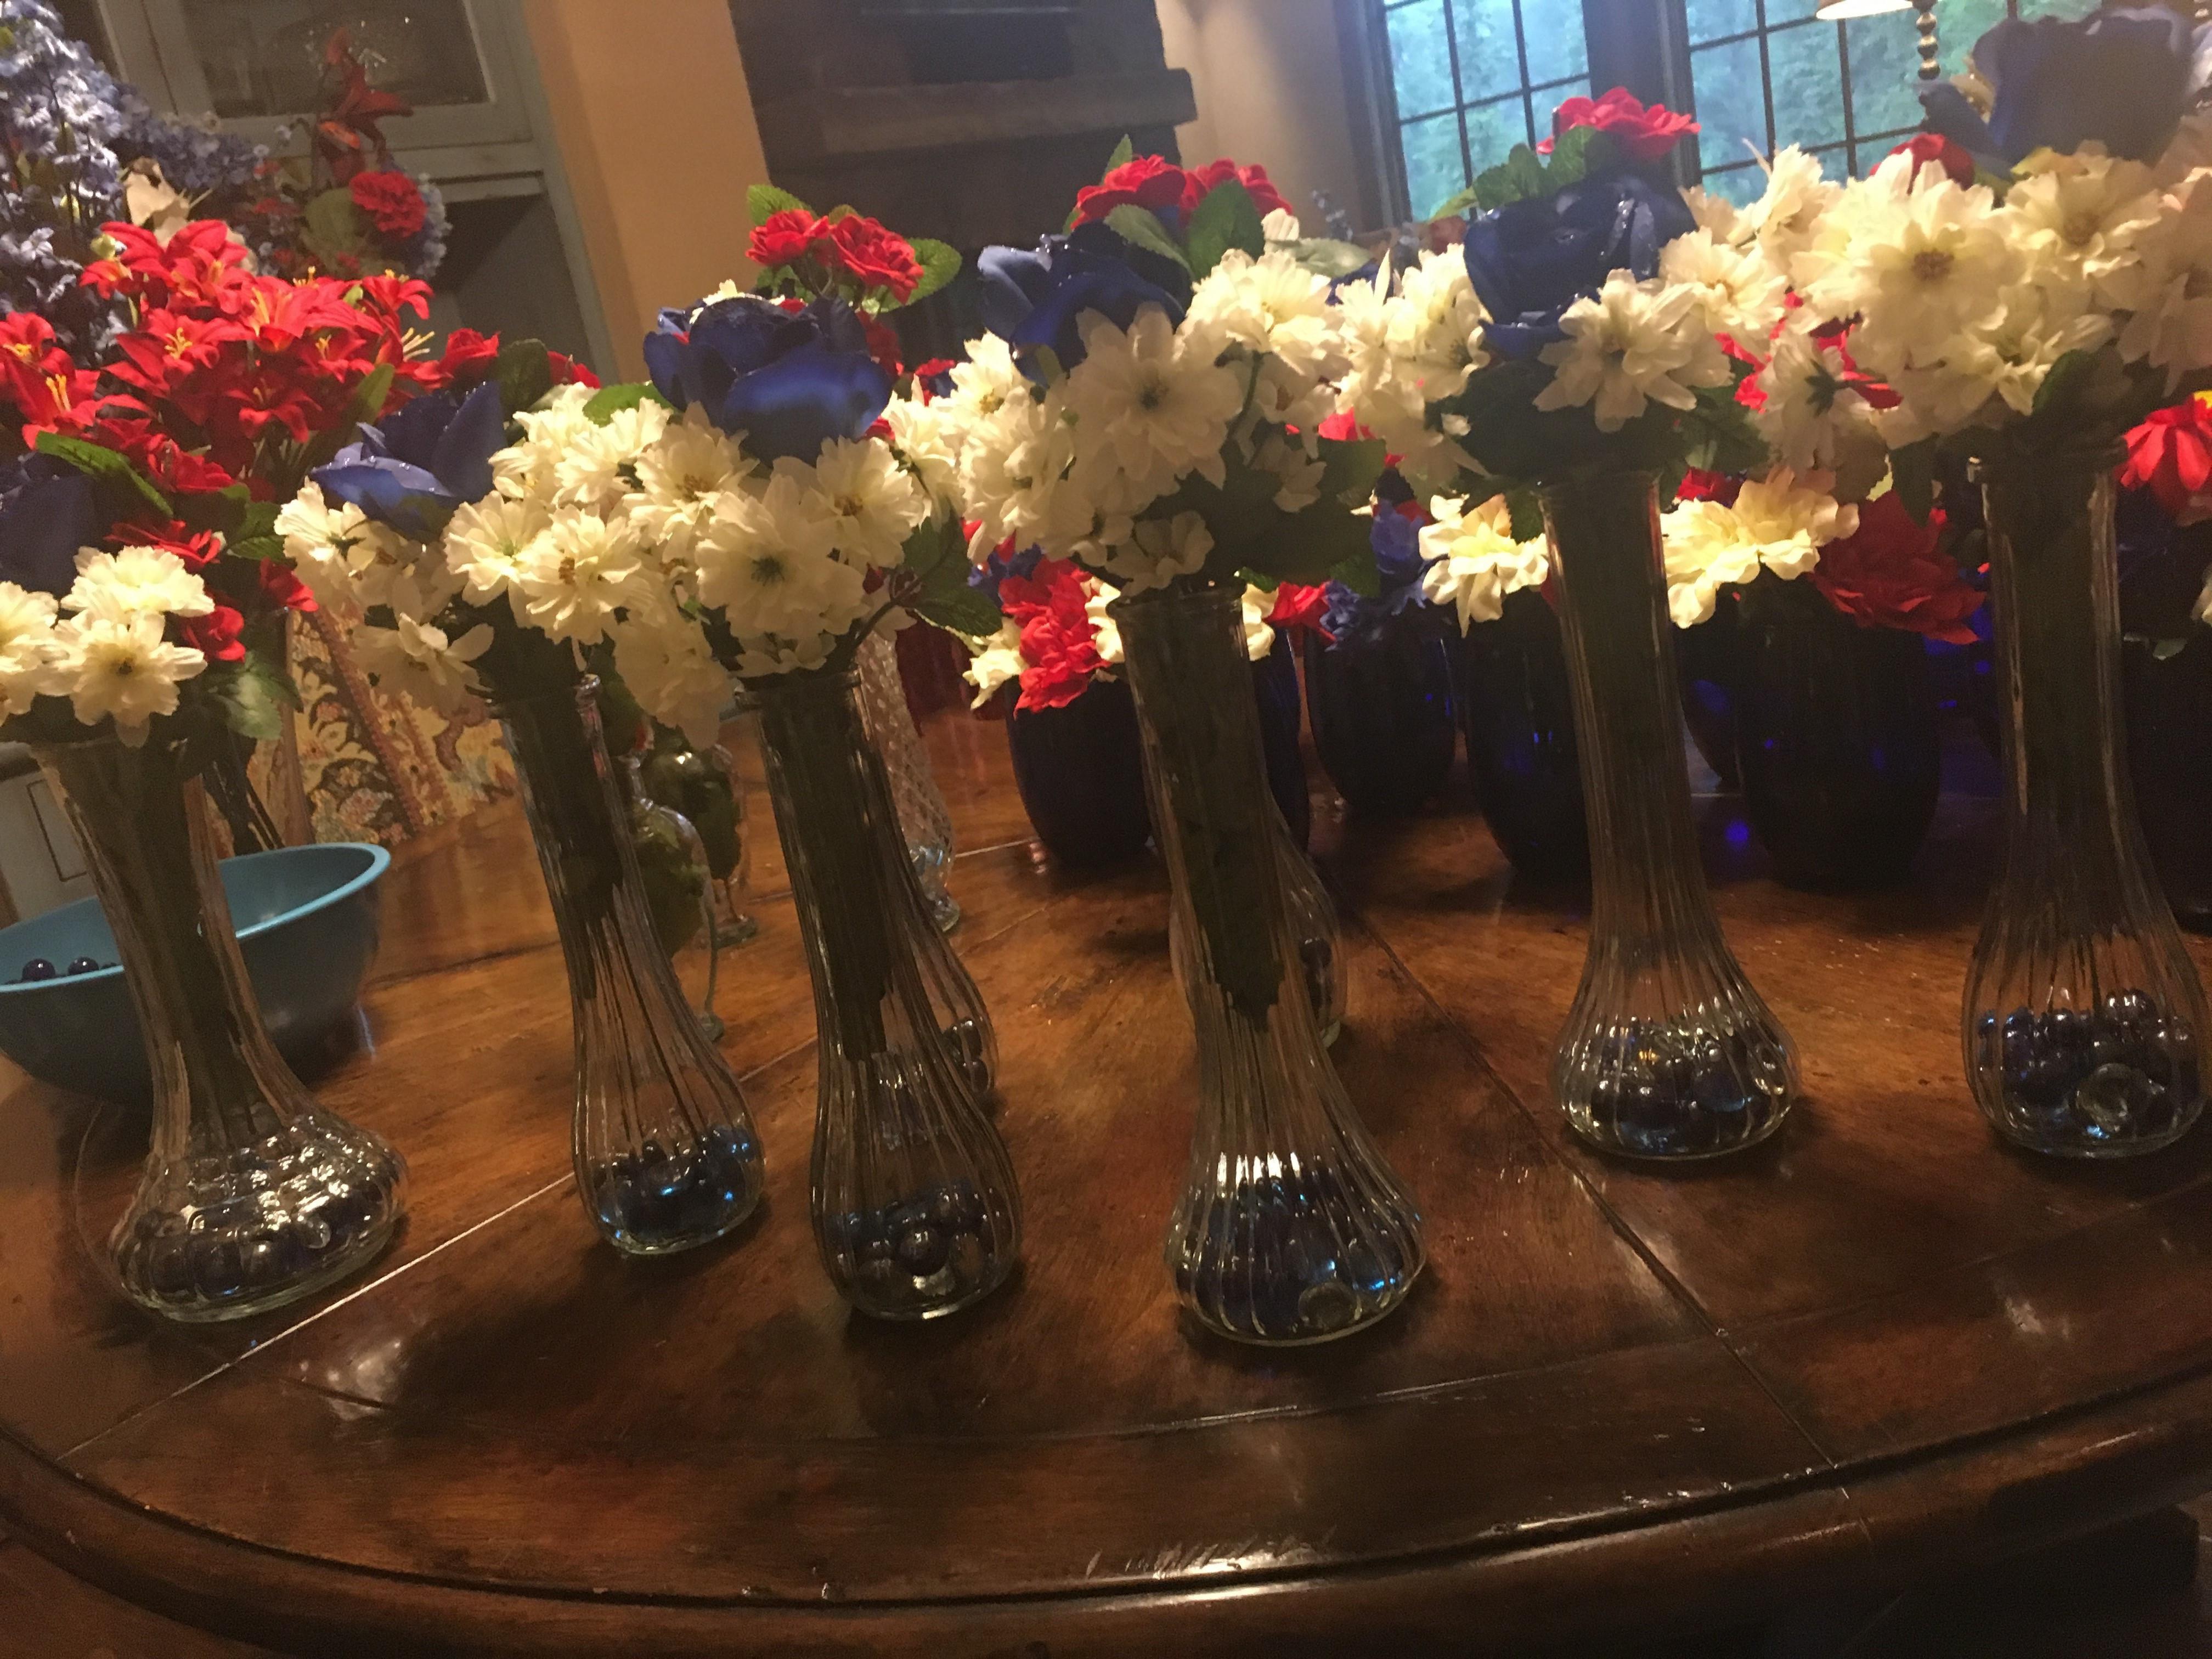 fake plants for vases of michaels glass vase pics dollar tree wedding decorations awesome h regarding dollar tree wedding decorations awesome h vases dollar vase i 0d